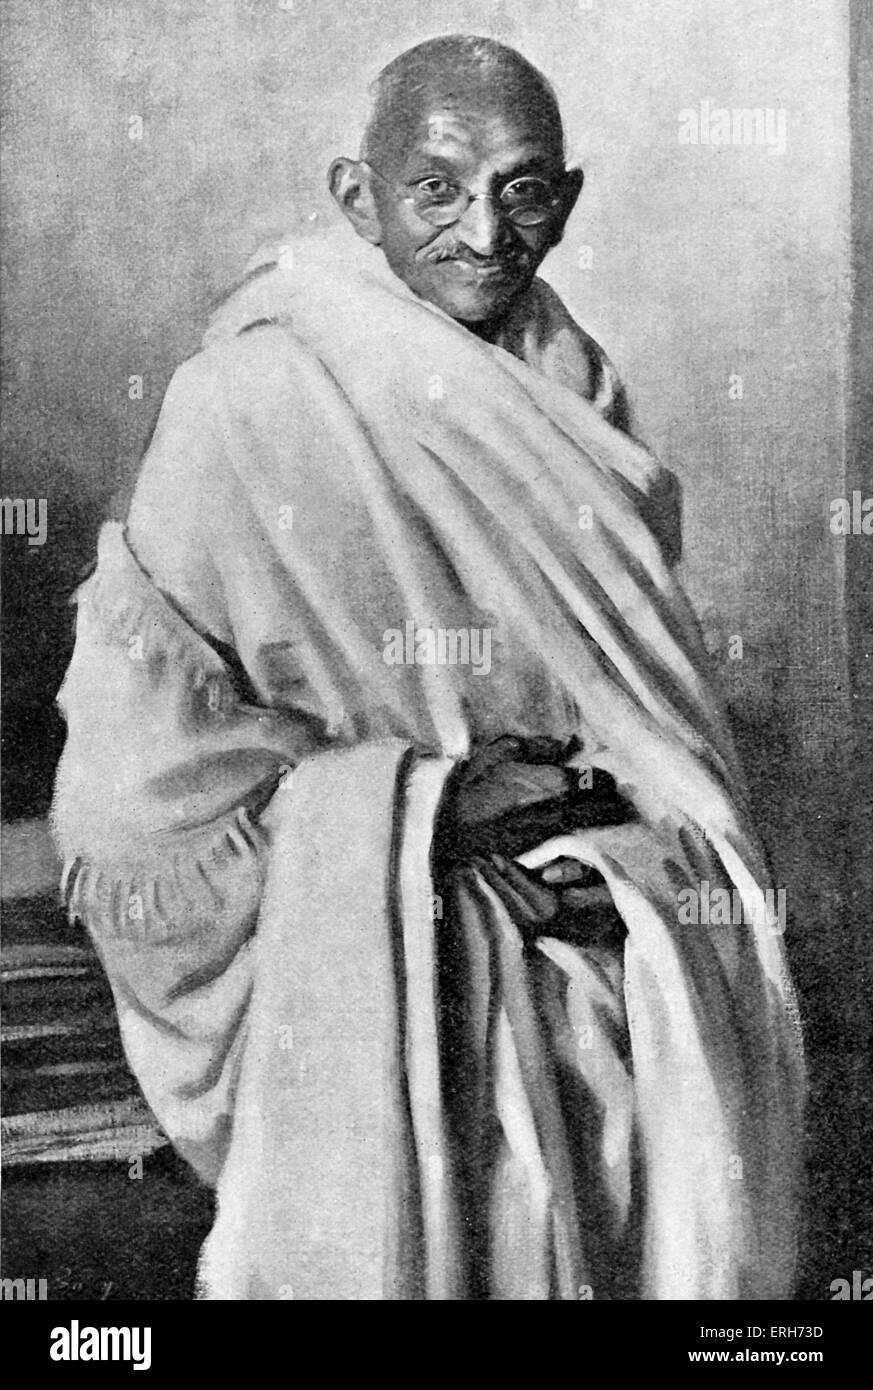 Mahatma Mohandas Karamchand Gandhi - I religiosi indiani righello e politico. 2 Ottobre 1869 - 30 gennaio 1948. Immagini Stock